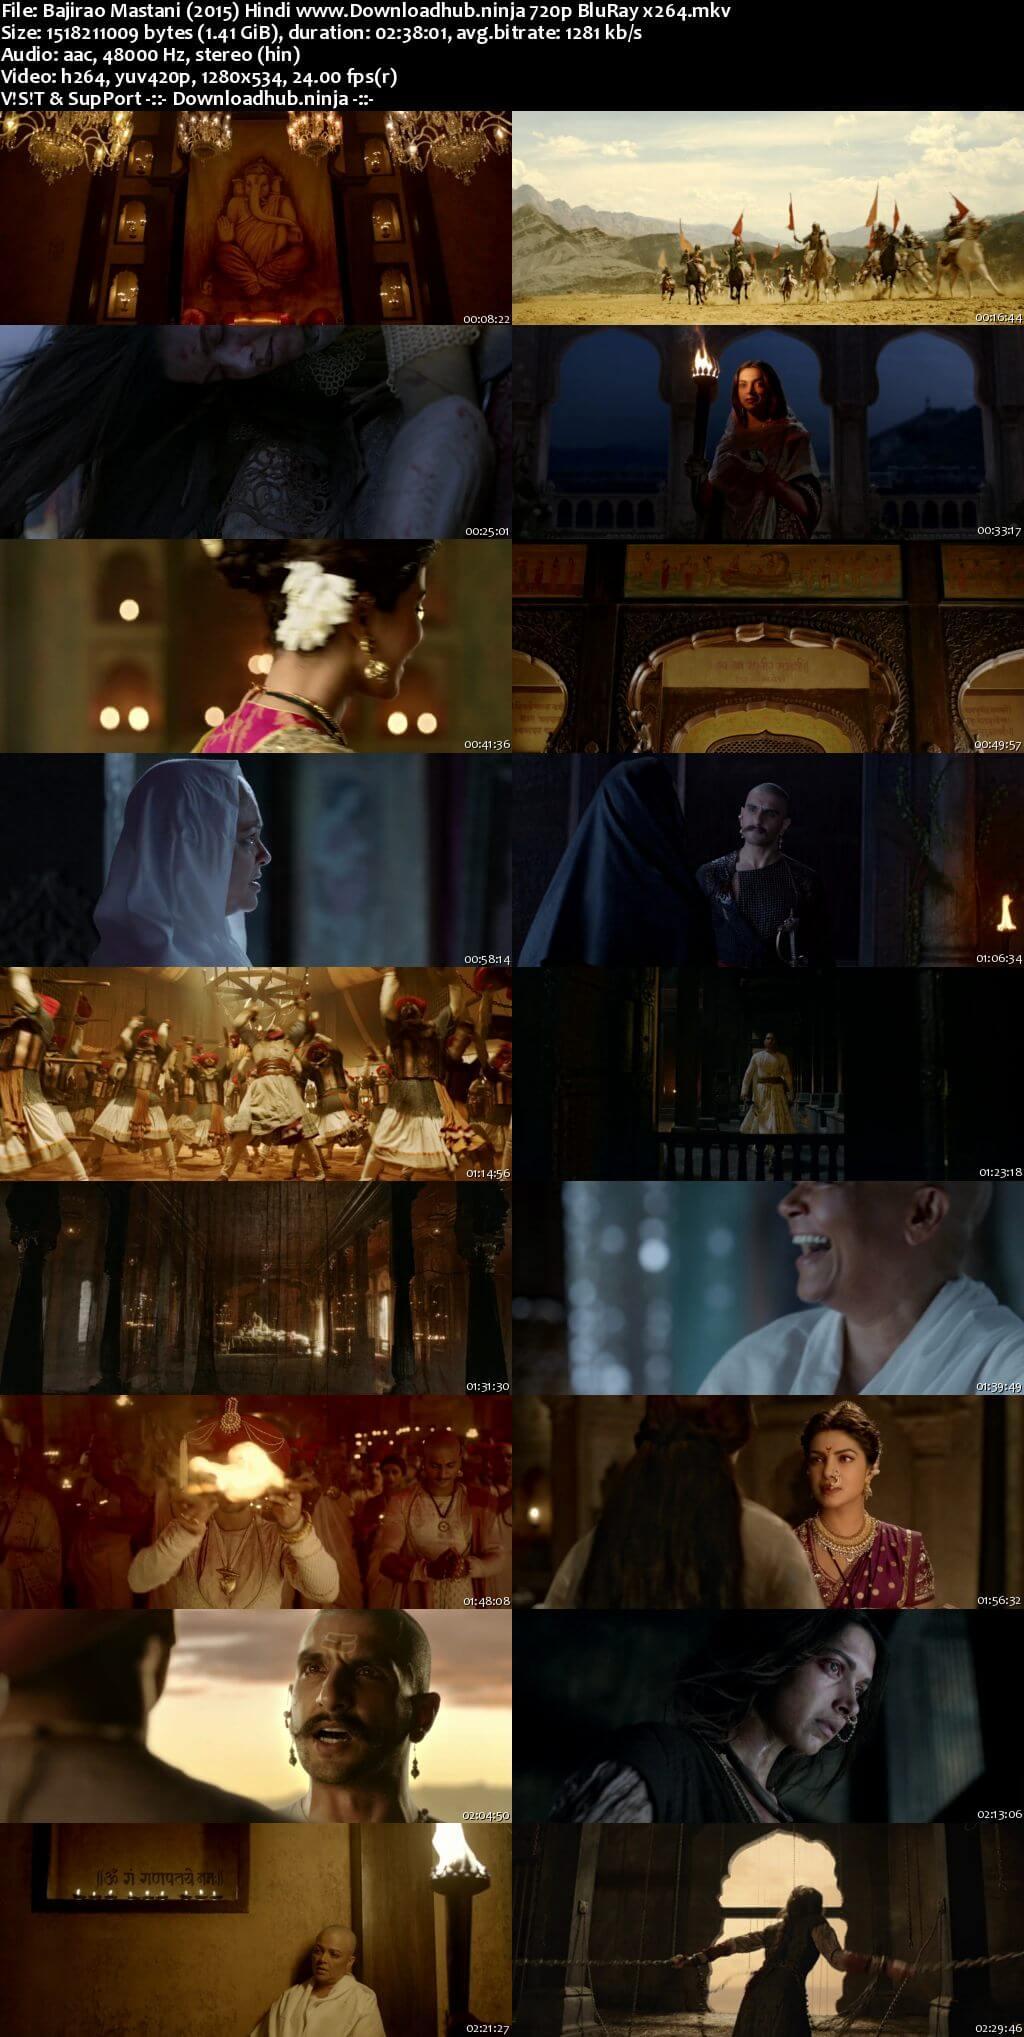 Bajirao Mastani 2015 Hindi 720p BluRay x264